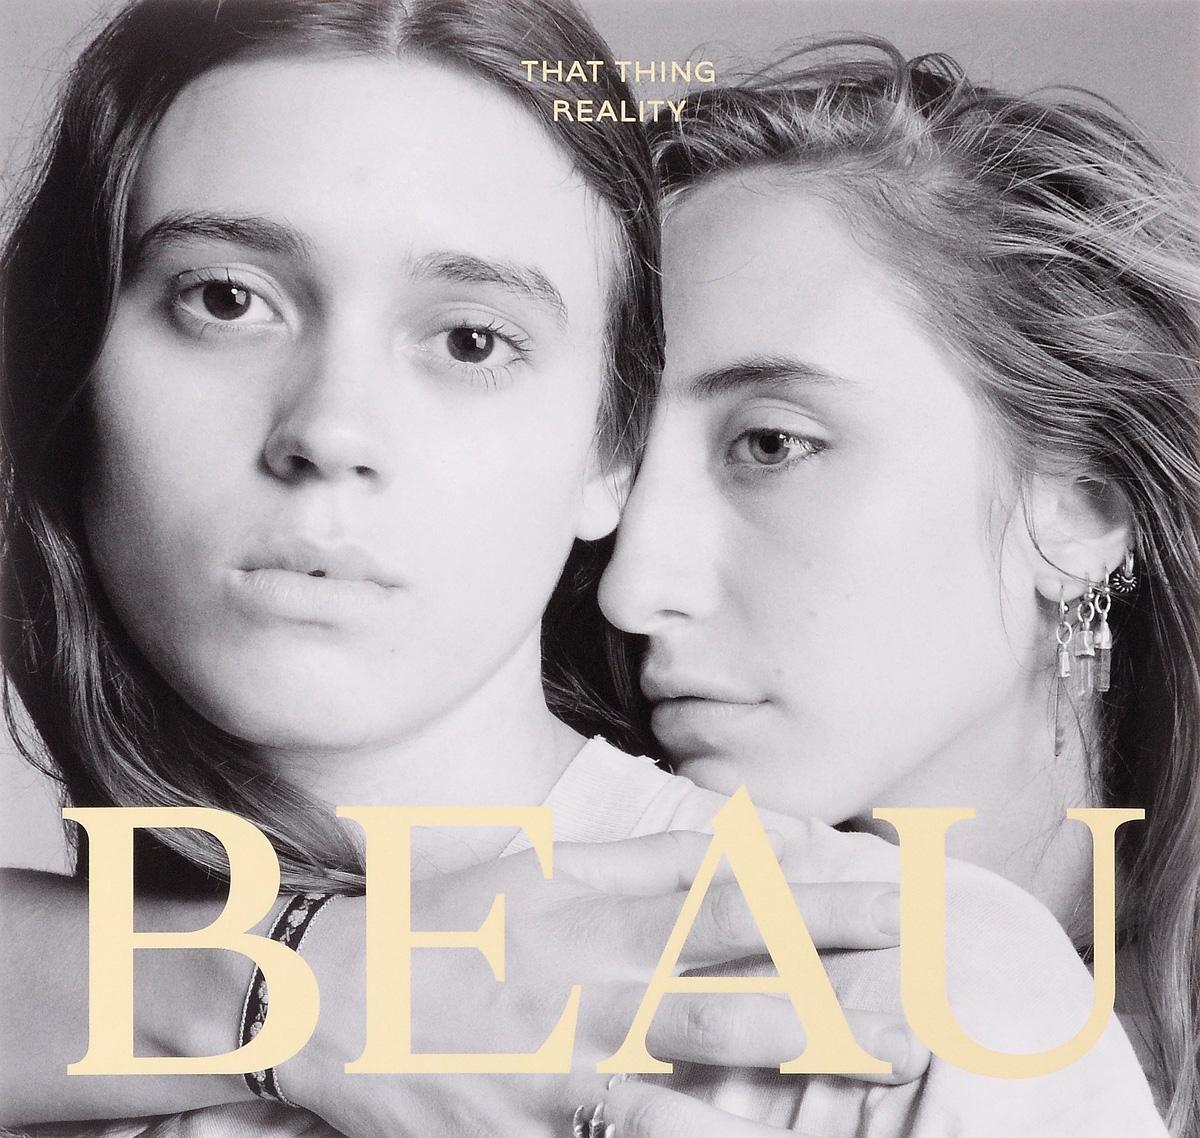 Beau Beau. That Thing Reality